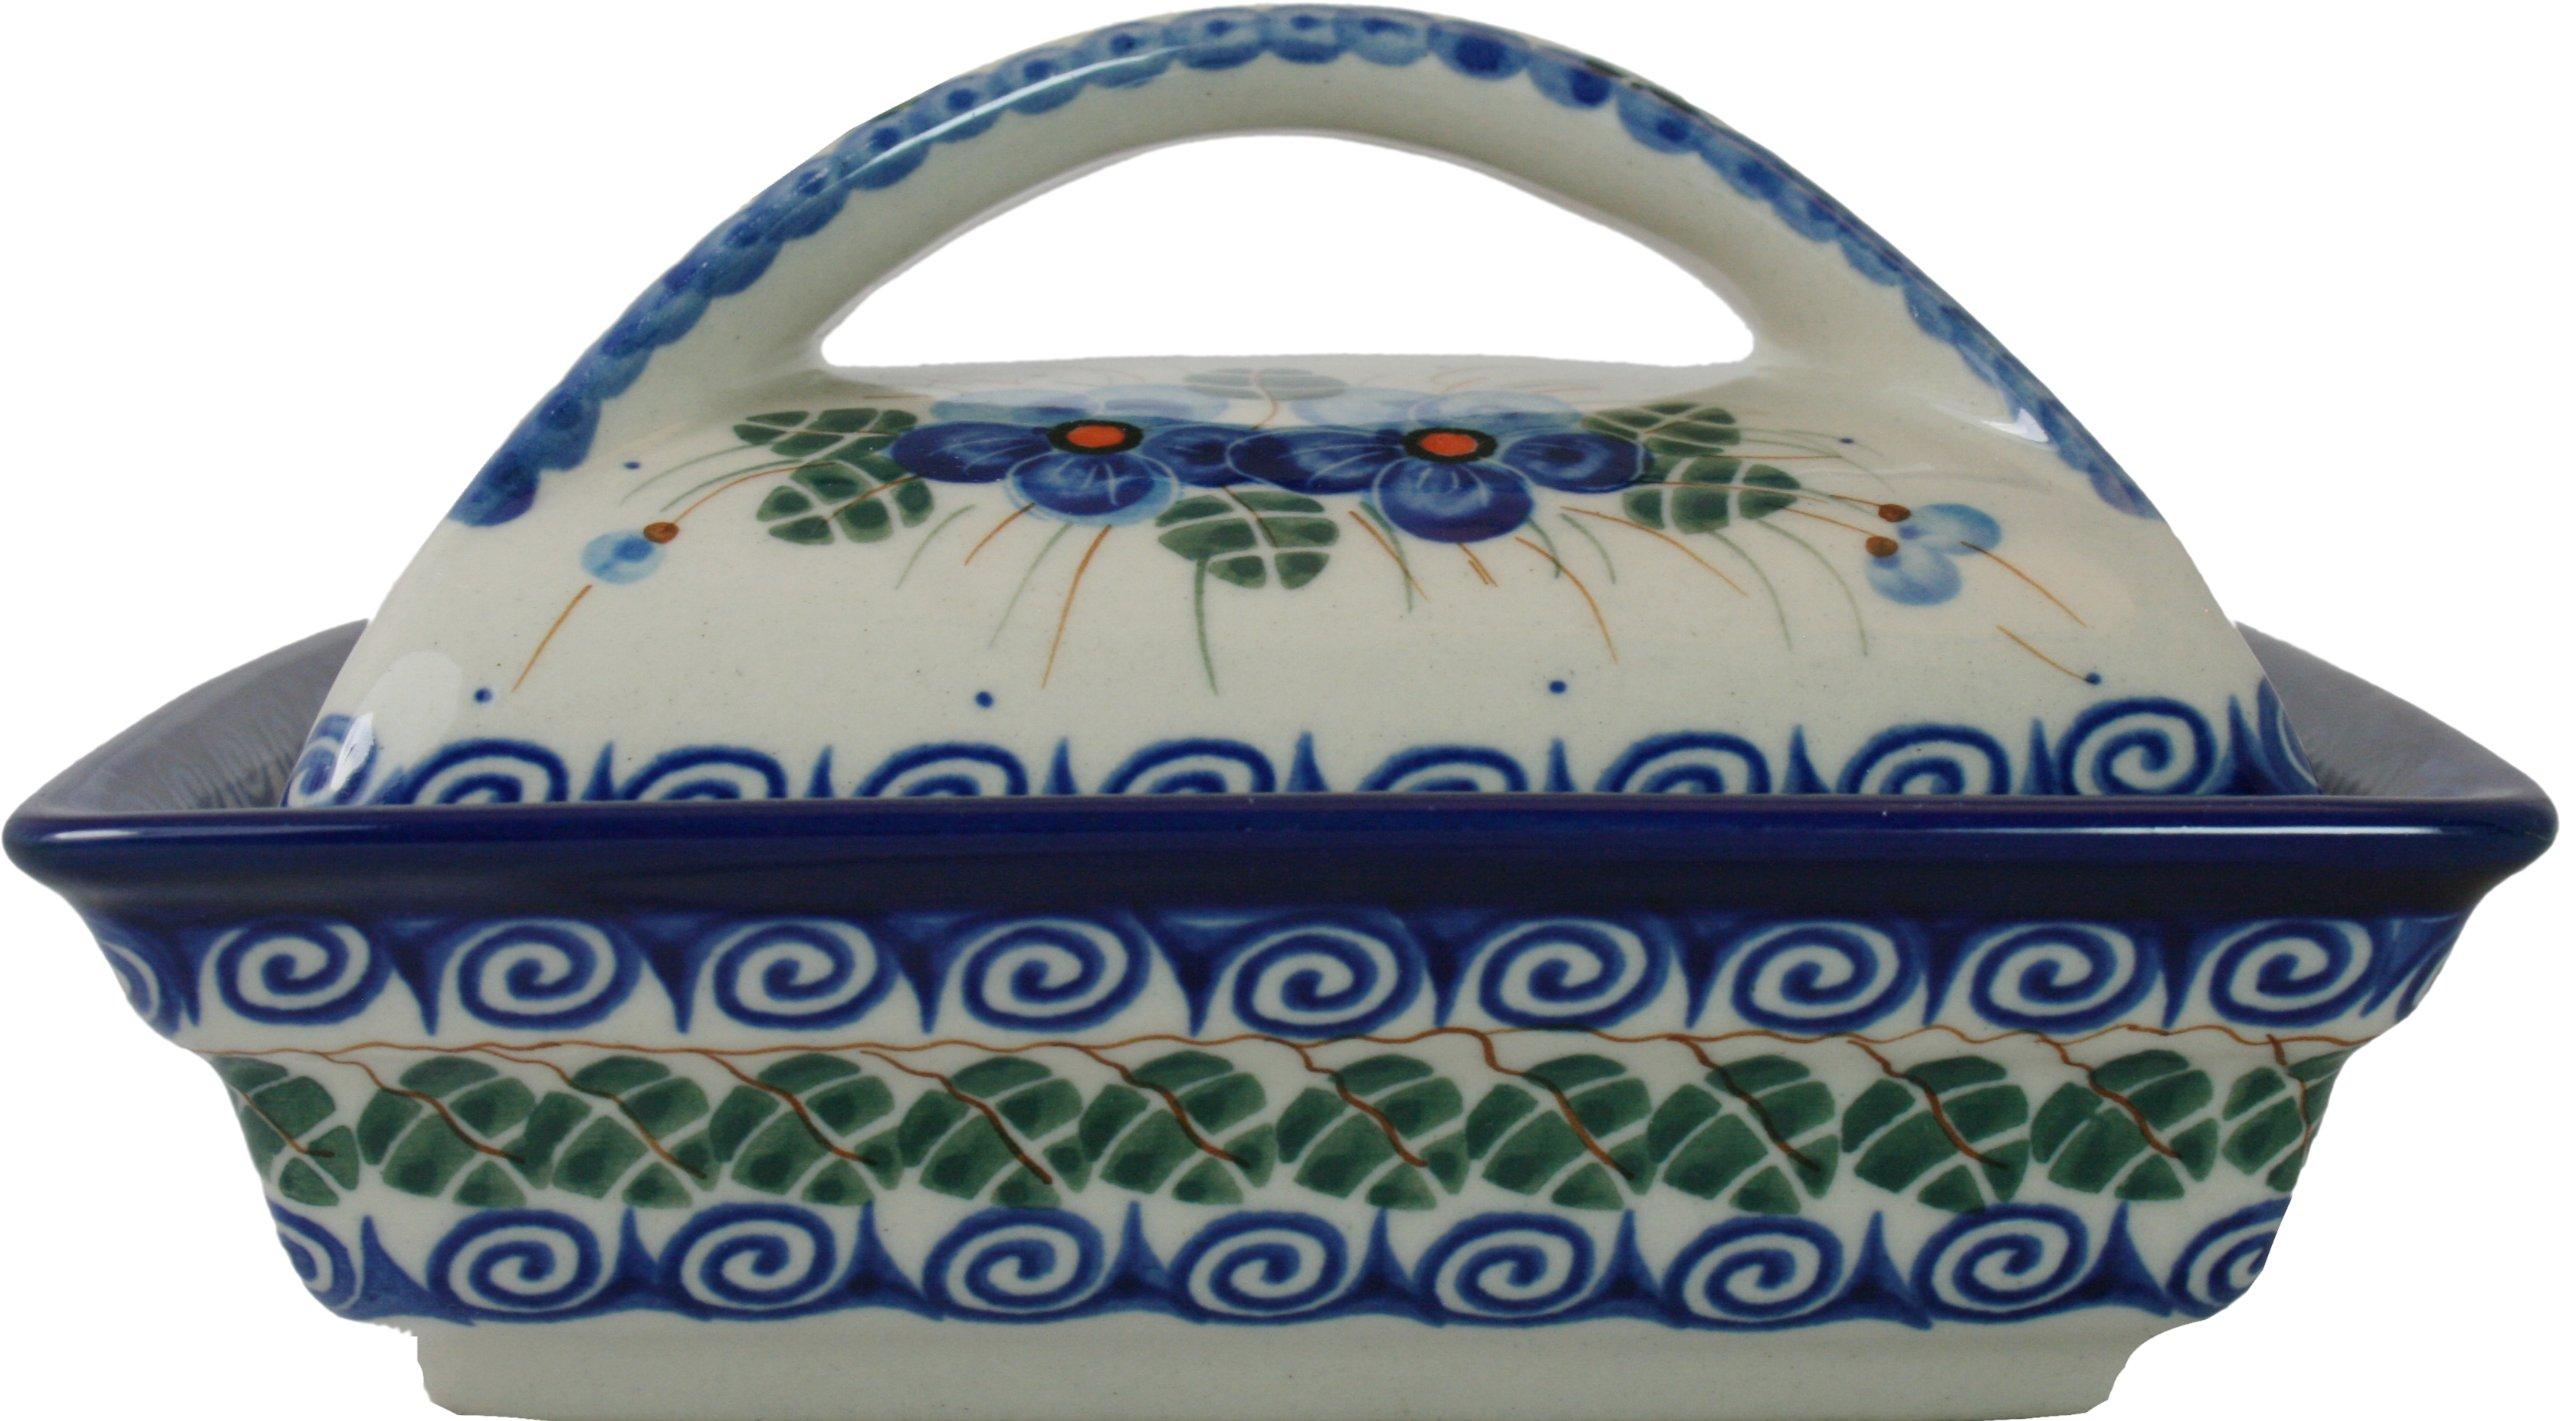 Polish Pottery Ceramika Boleslawiec, 0352/162, Butter Dish Deep, 2 Cubes, Royal Blue Patterns with Blue Pansy Flower Motif by Polish Pottery Ceramika Boleslawiec (Image #3)